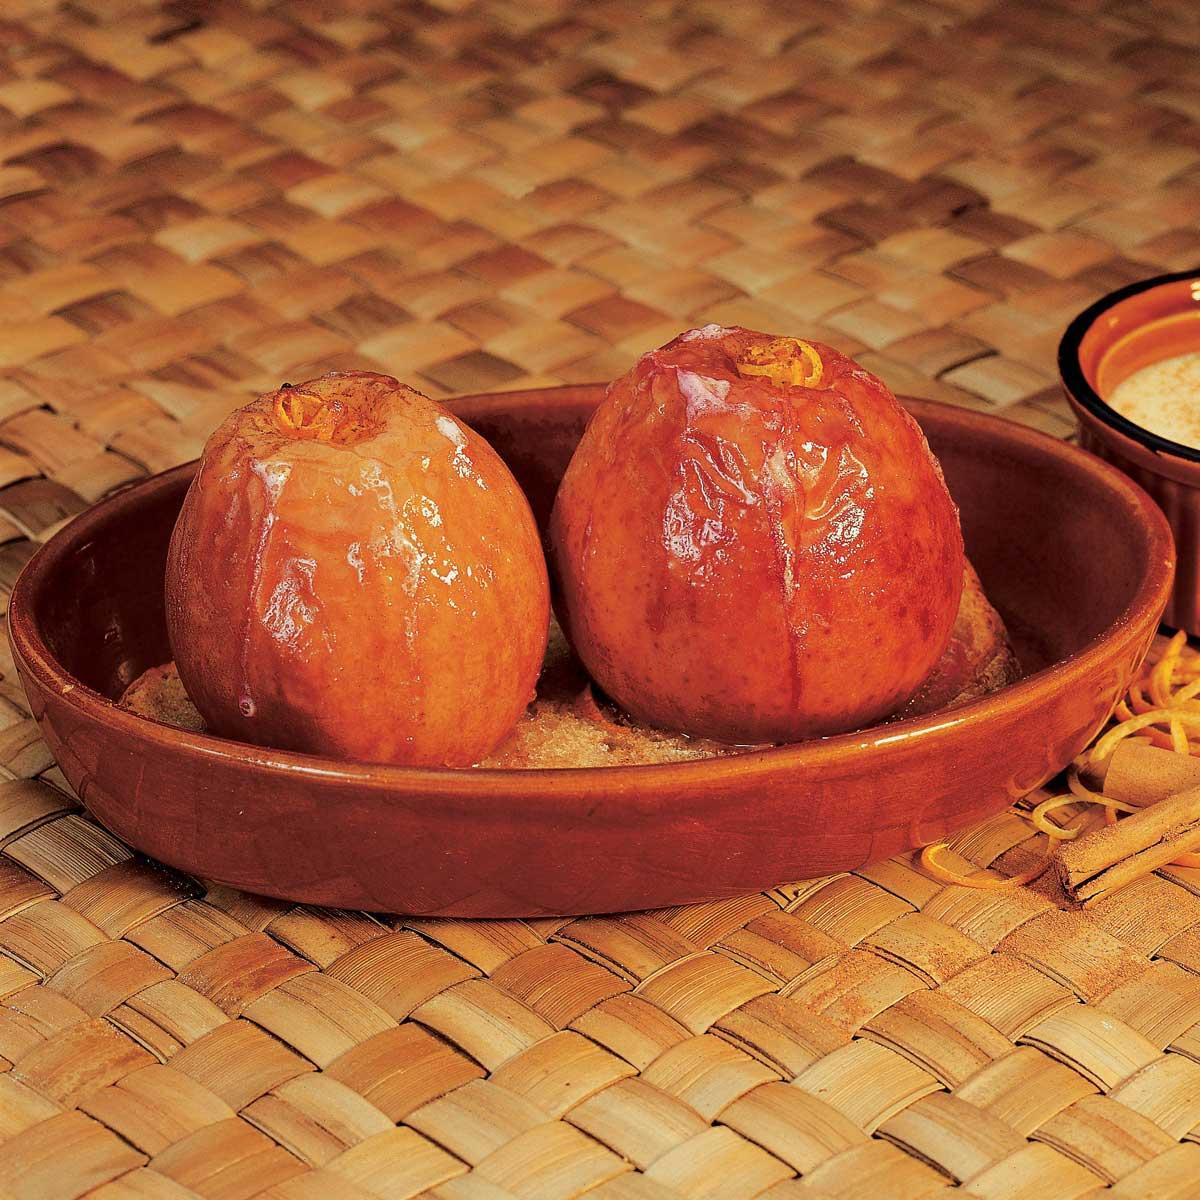 recette pommes grand m re cr me la cannelle cuisine madame figaro. Black Bedroom Furniture Sets. Home Design Ideas